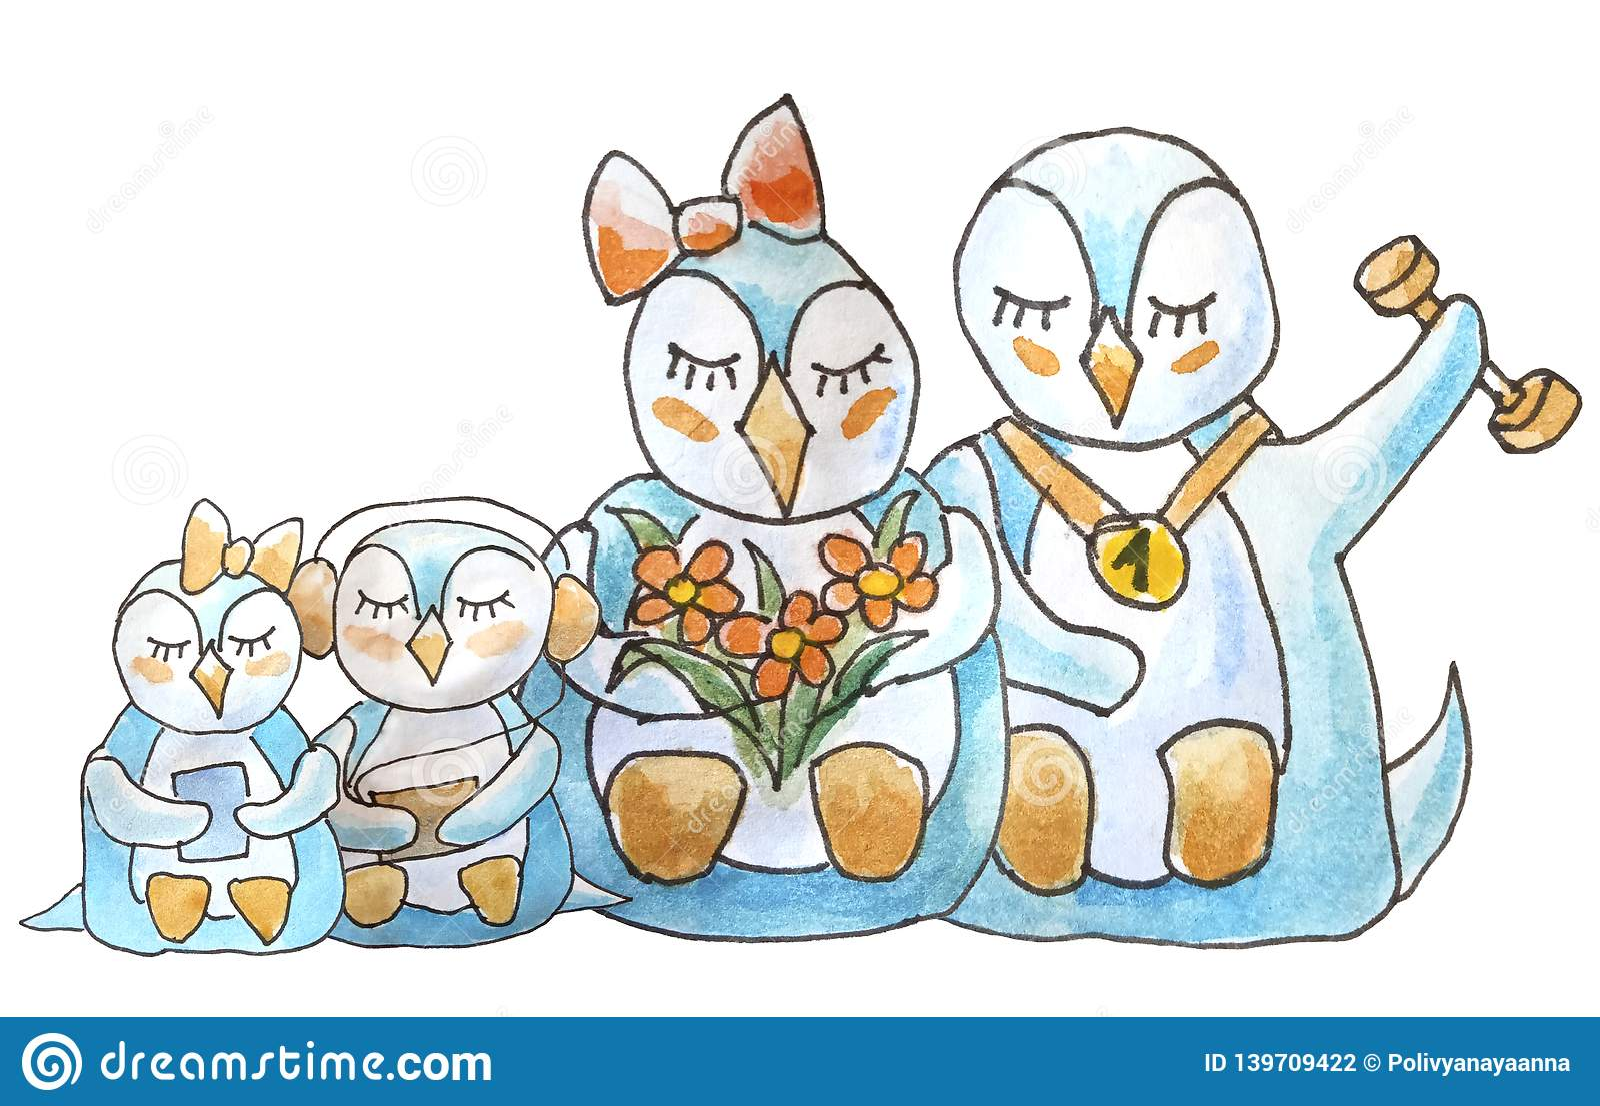 Familia de pingüinos en el fondo blanco